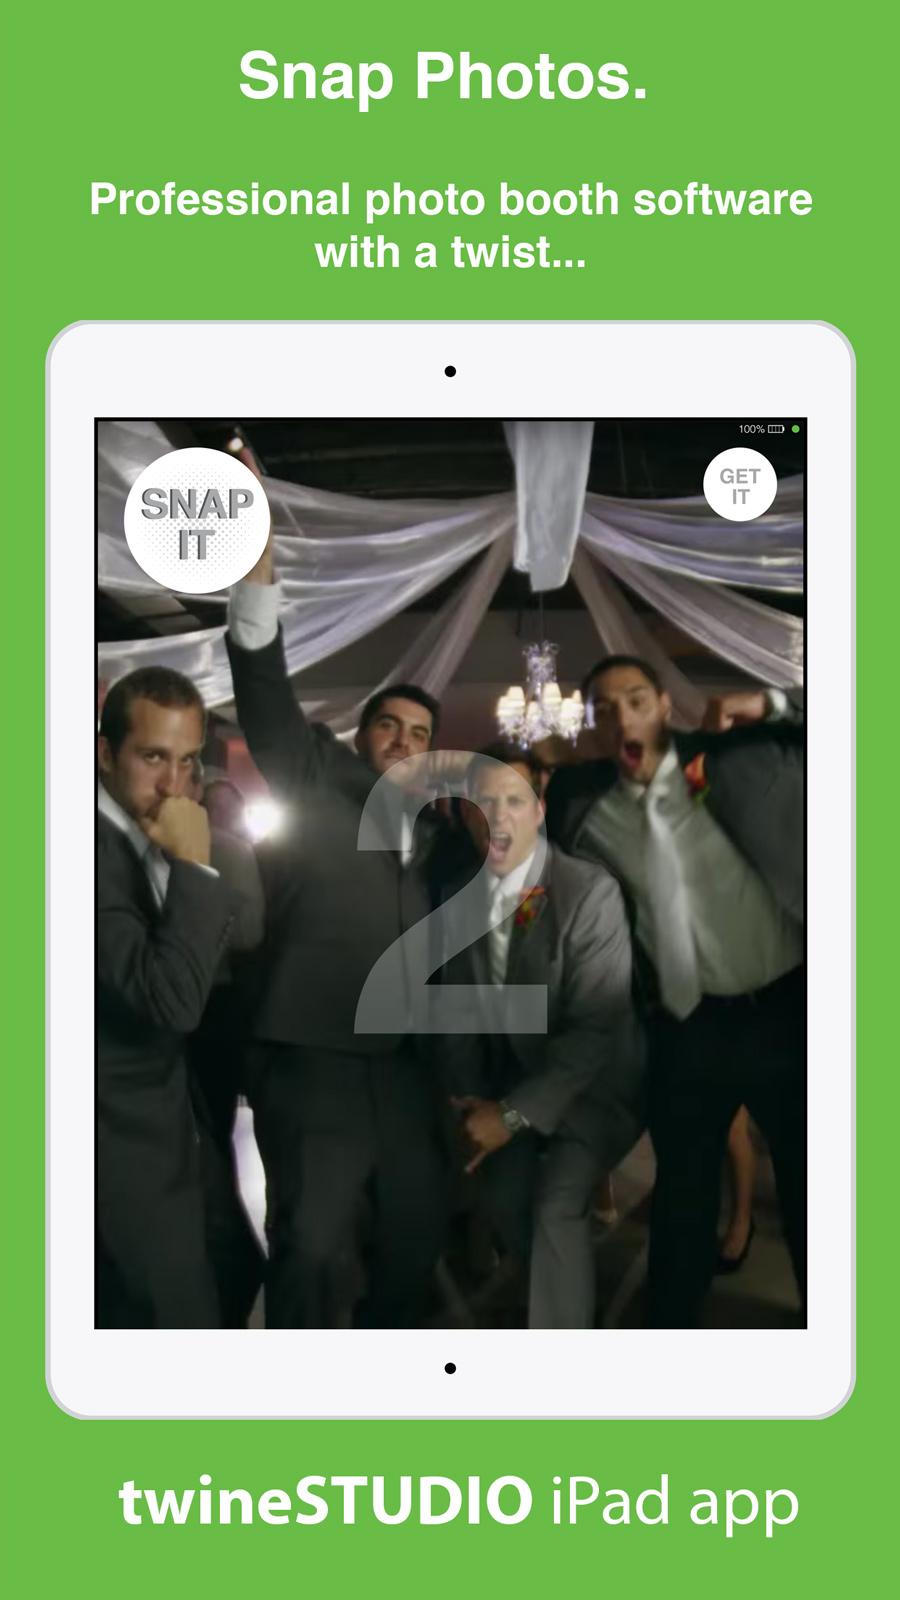 twineSTUDIO iPad app